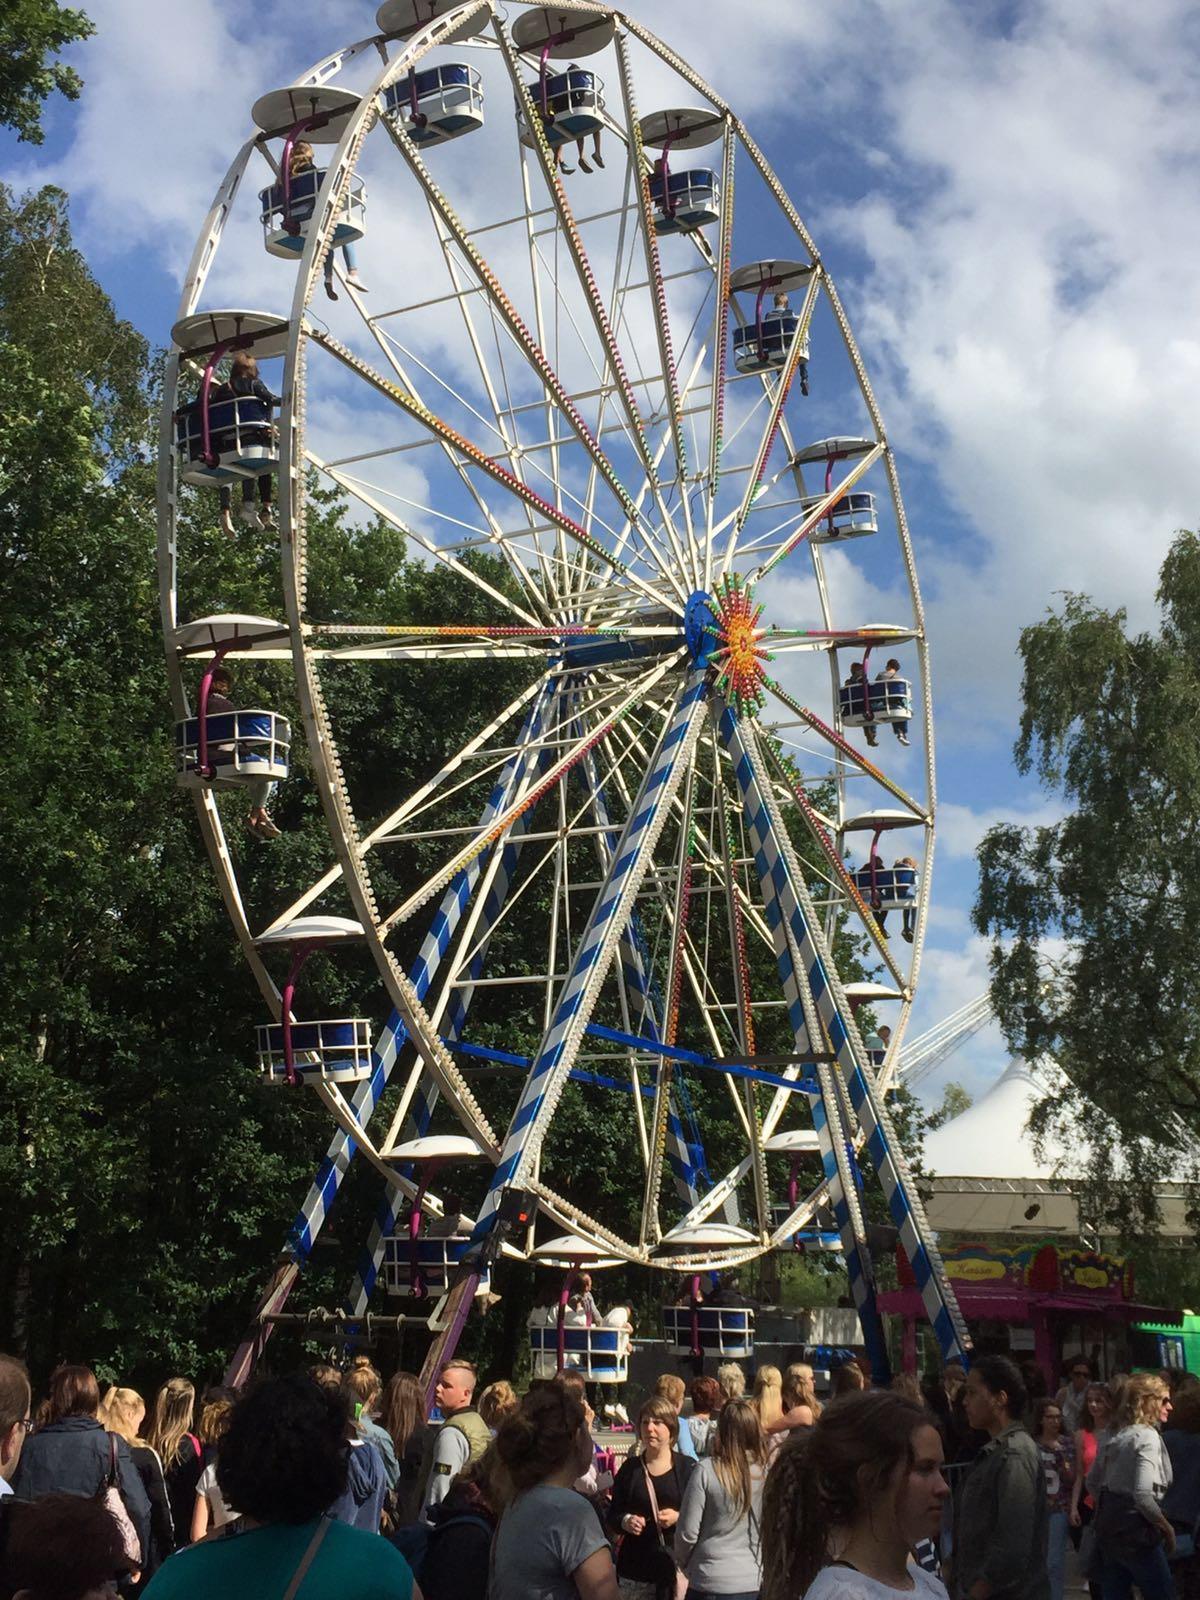 Share A Perfect Day – Hilvarenbeek